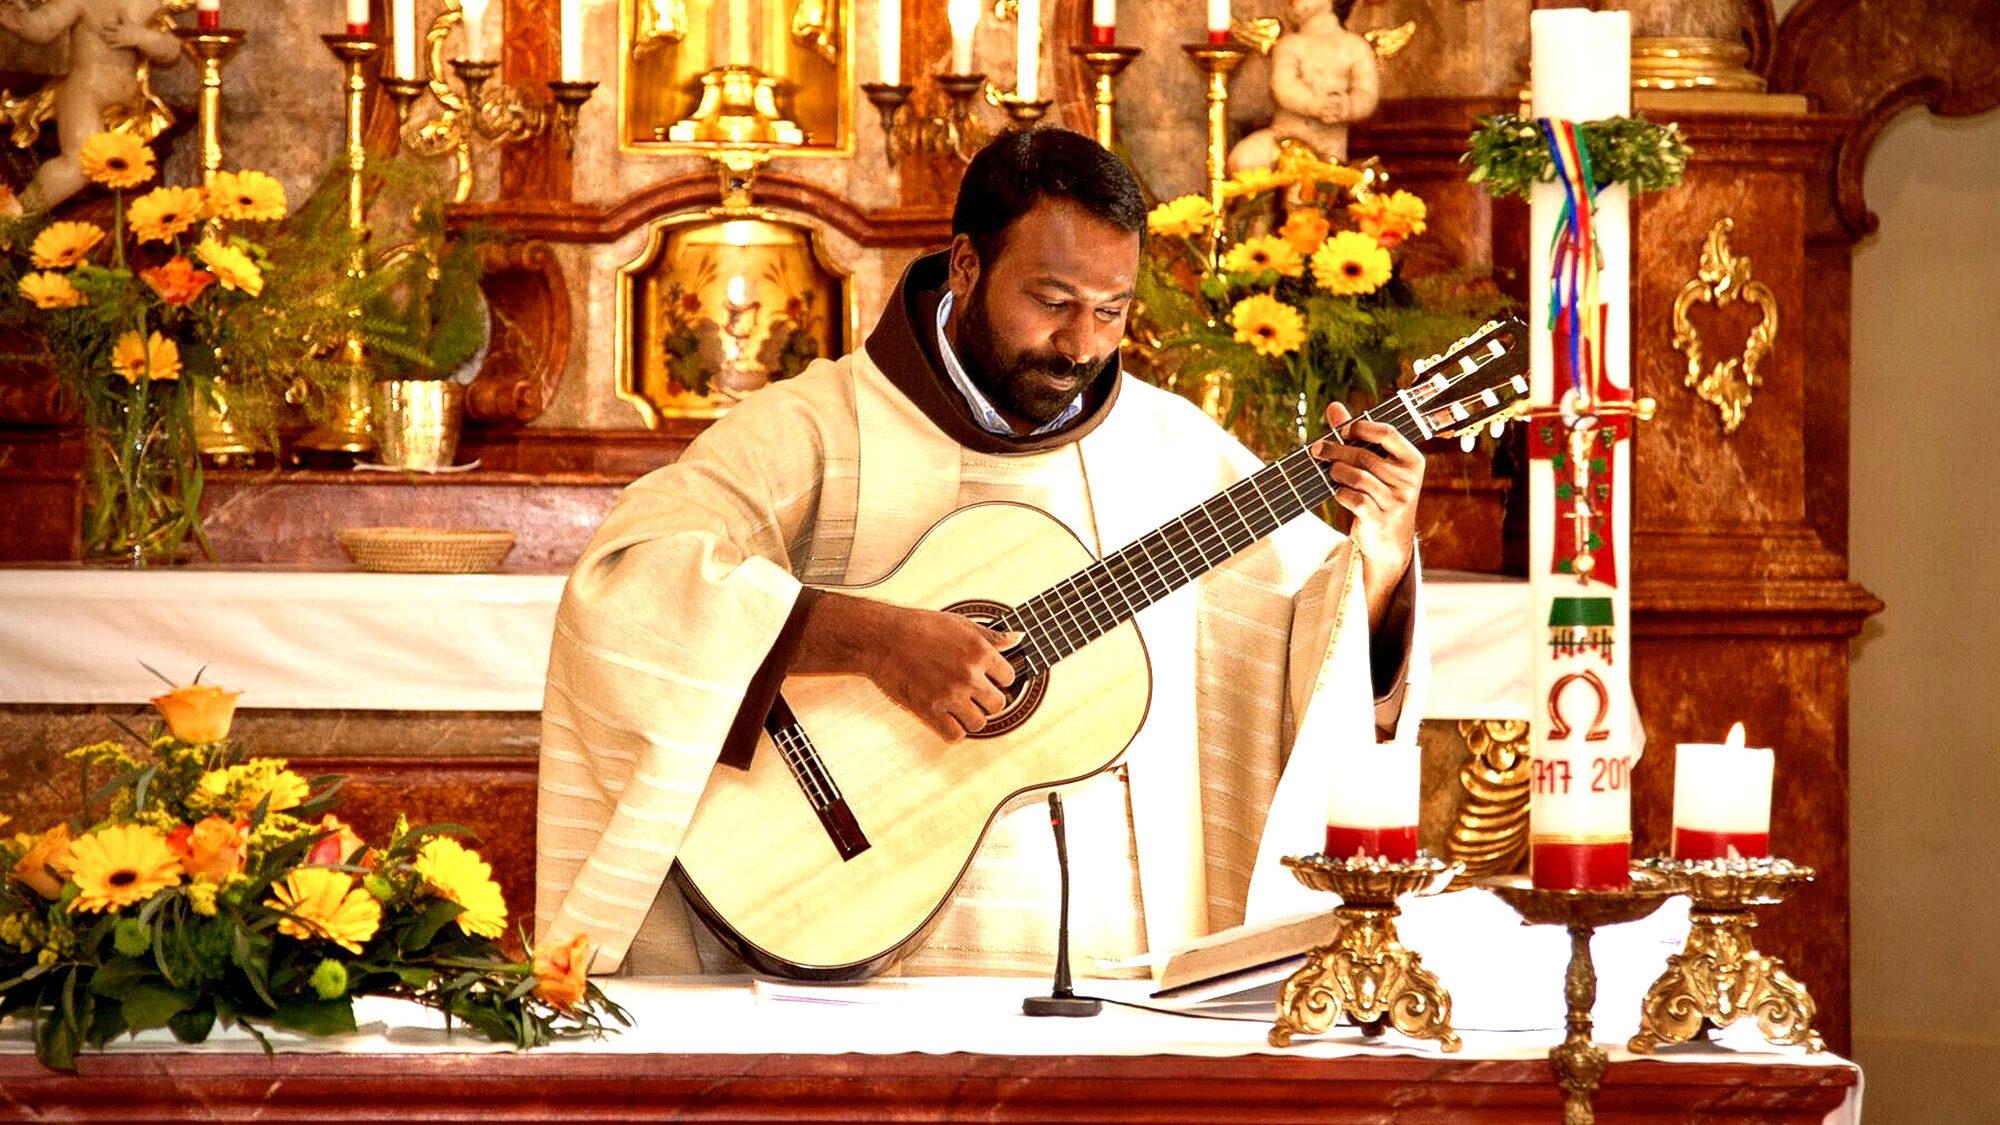 VIDEO: Rapping Monk Seeks to Spread Spiritual Word